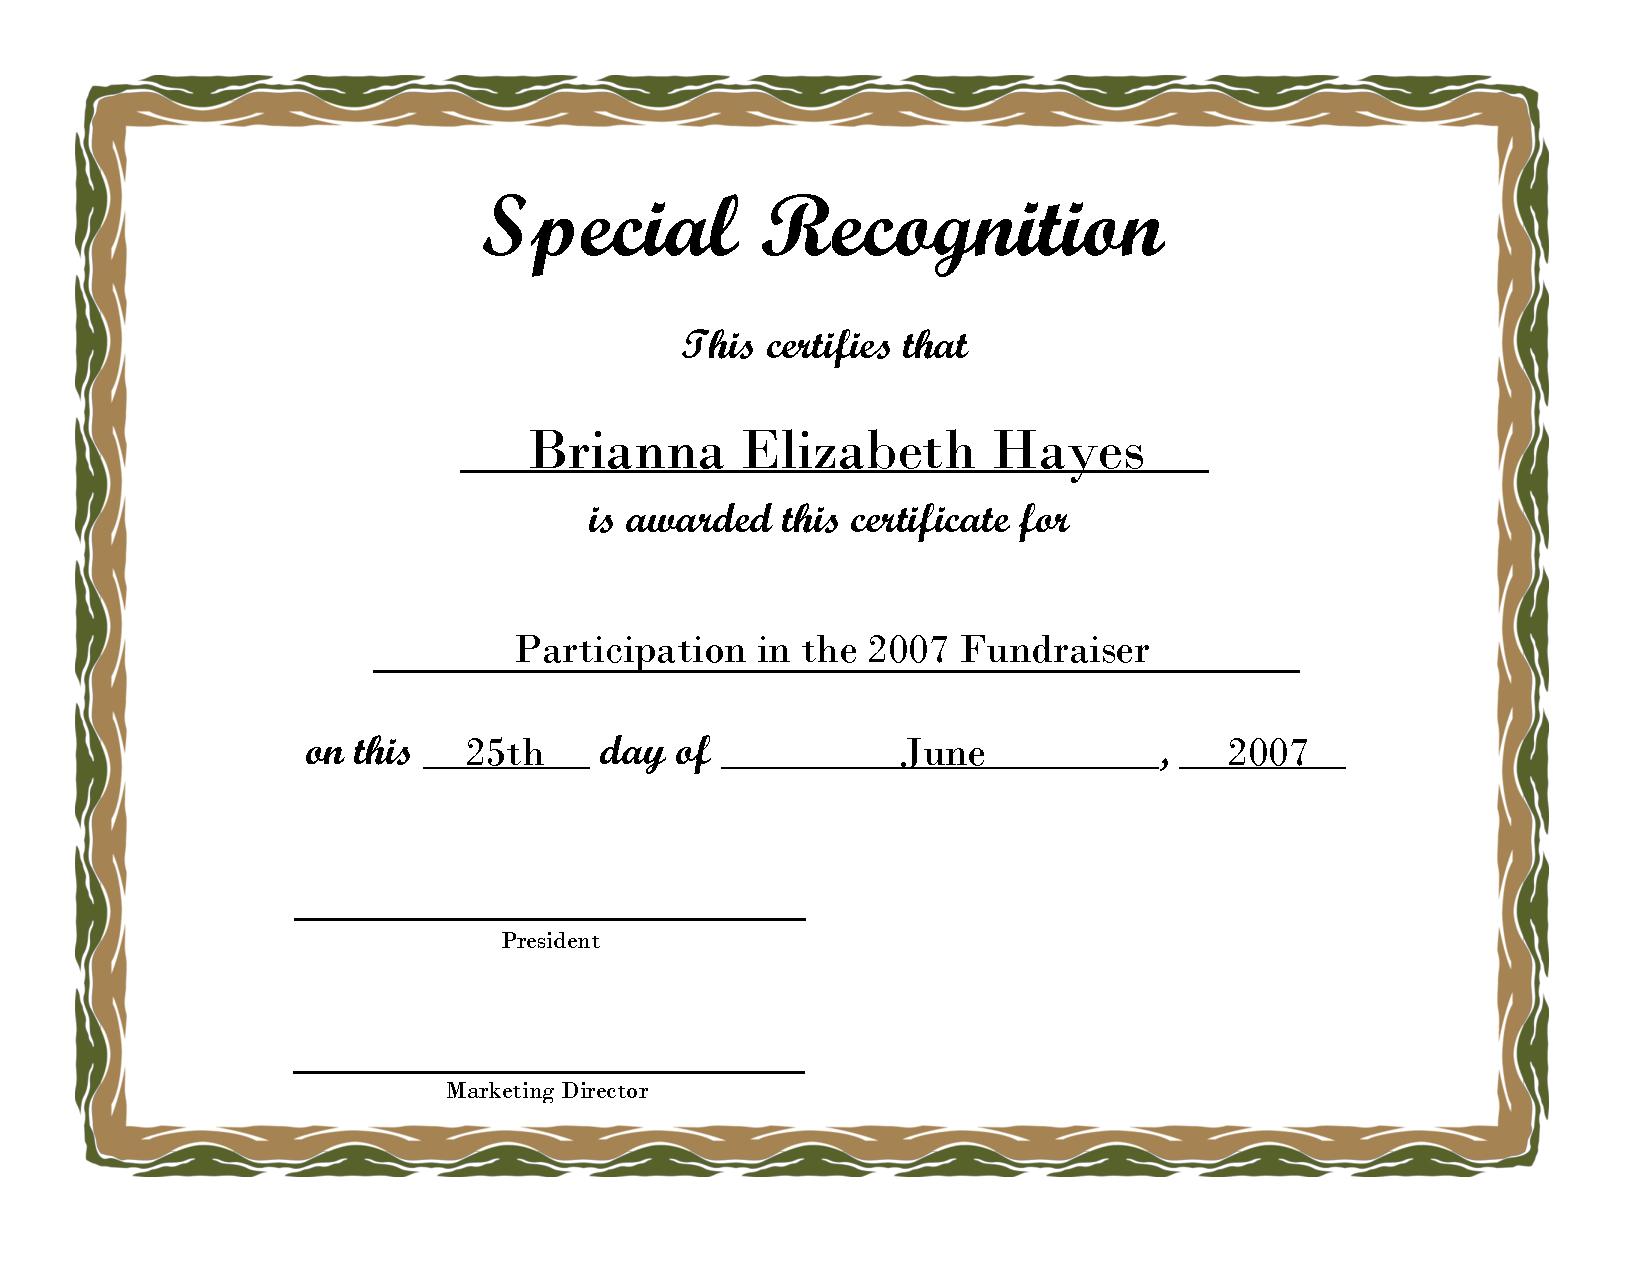 Free Printable Award Certificate Borders | Free Printable - Free Printable Diploma Template